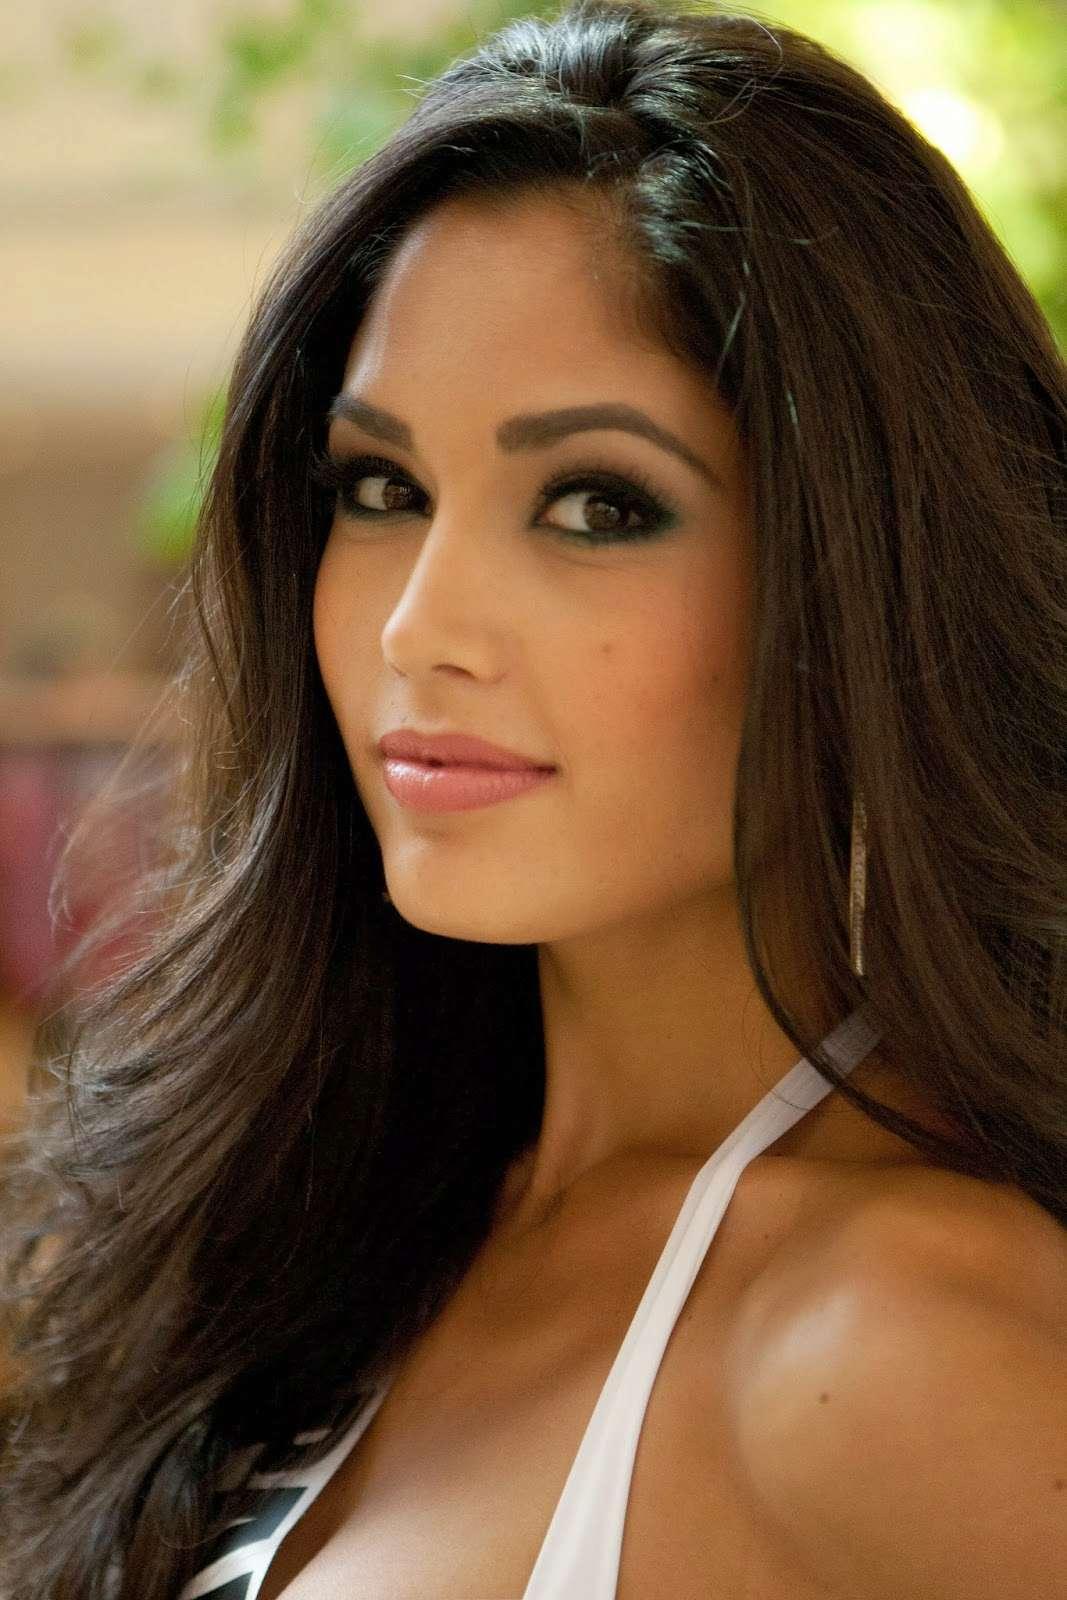 patricia yurena rodriguez, miss espana 2008/2013, 1st runner-up de miss universe 2013. - Página 5 Uni20116